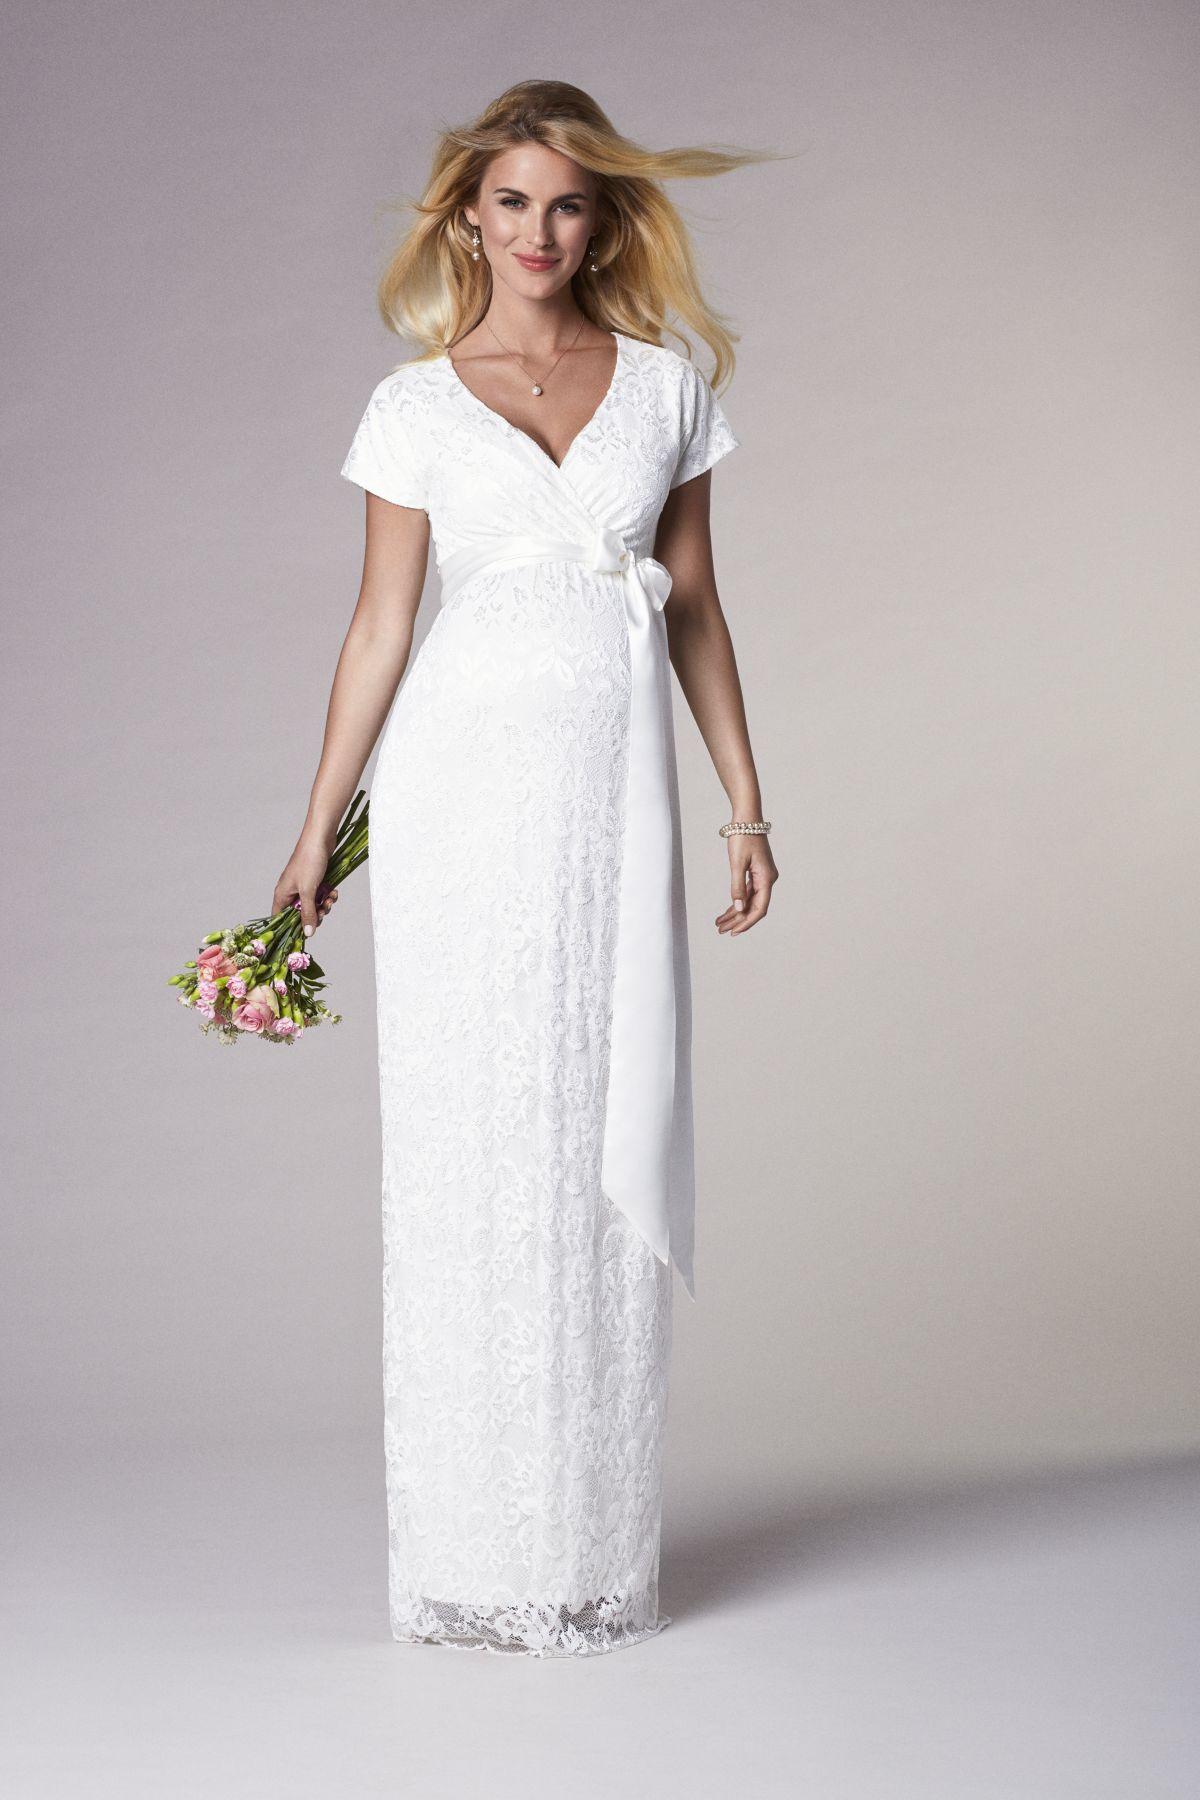 studioagnes-tehotenske-svatebni-saty-bridget-2-gown-long